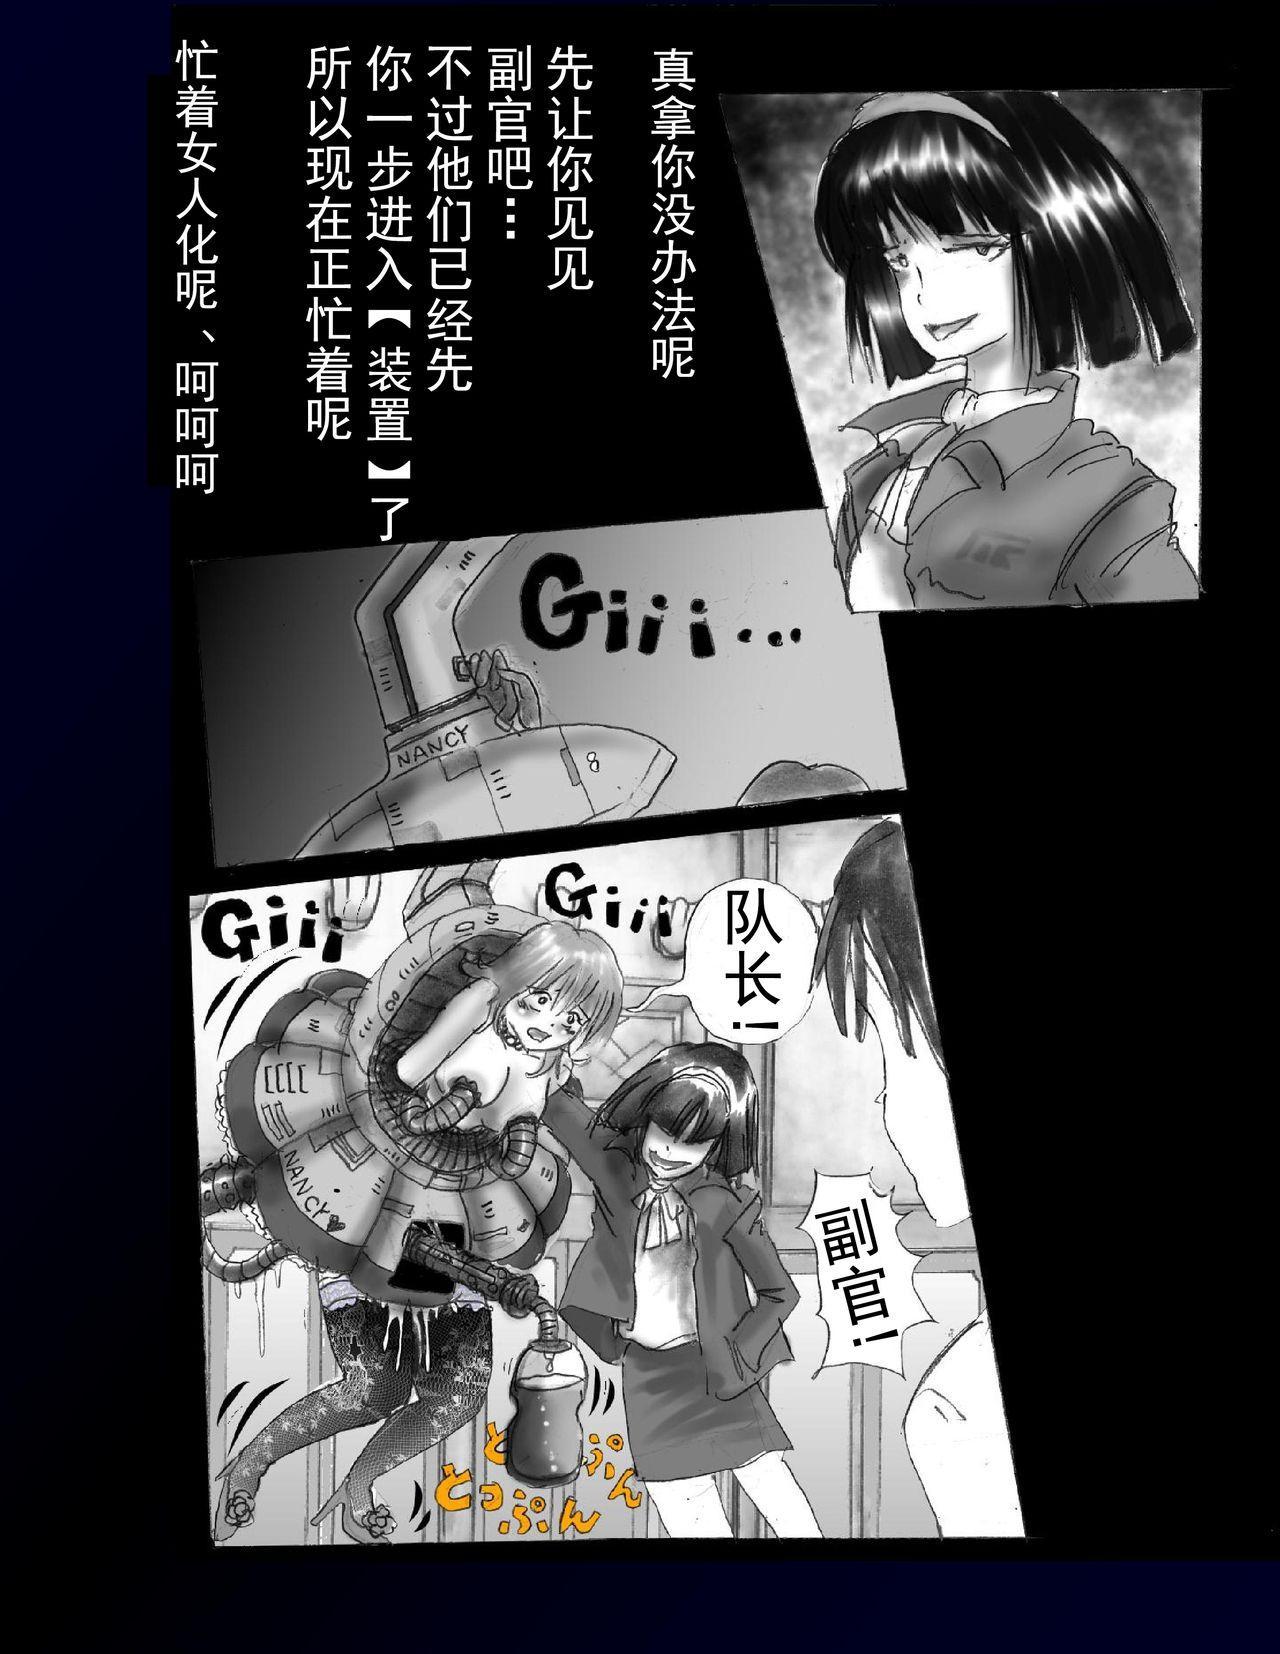 Kyousei Nyotaika Dress 13